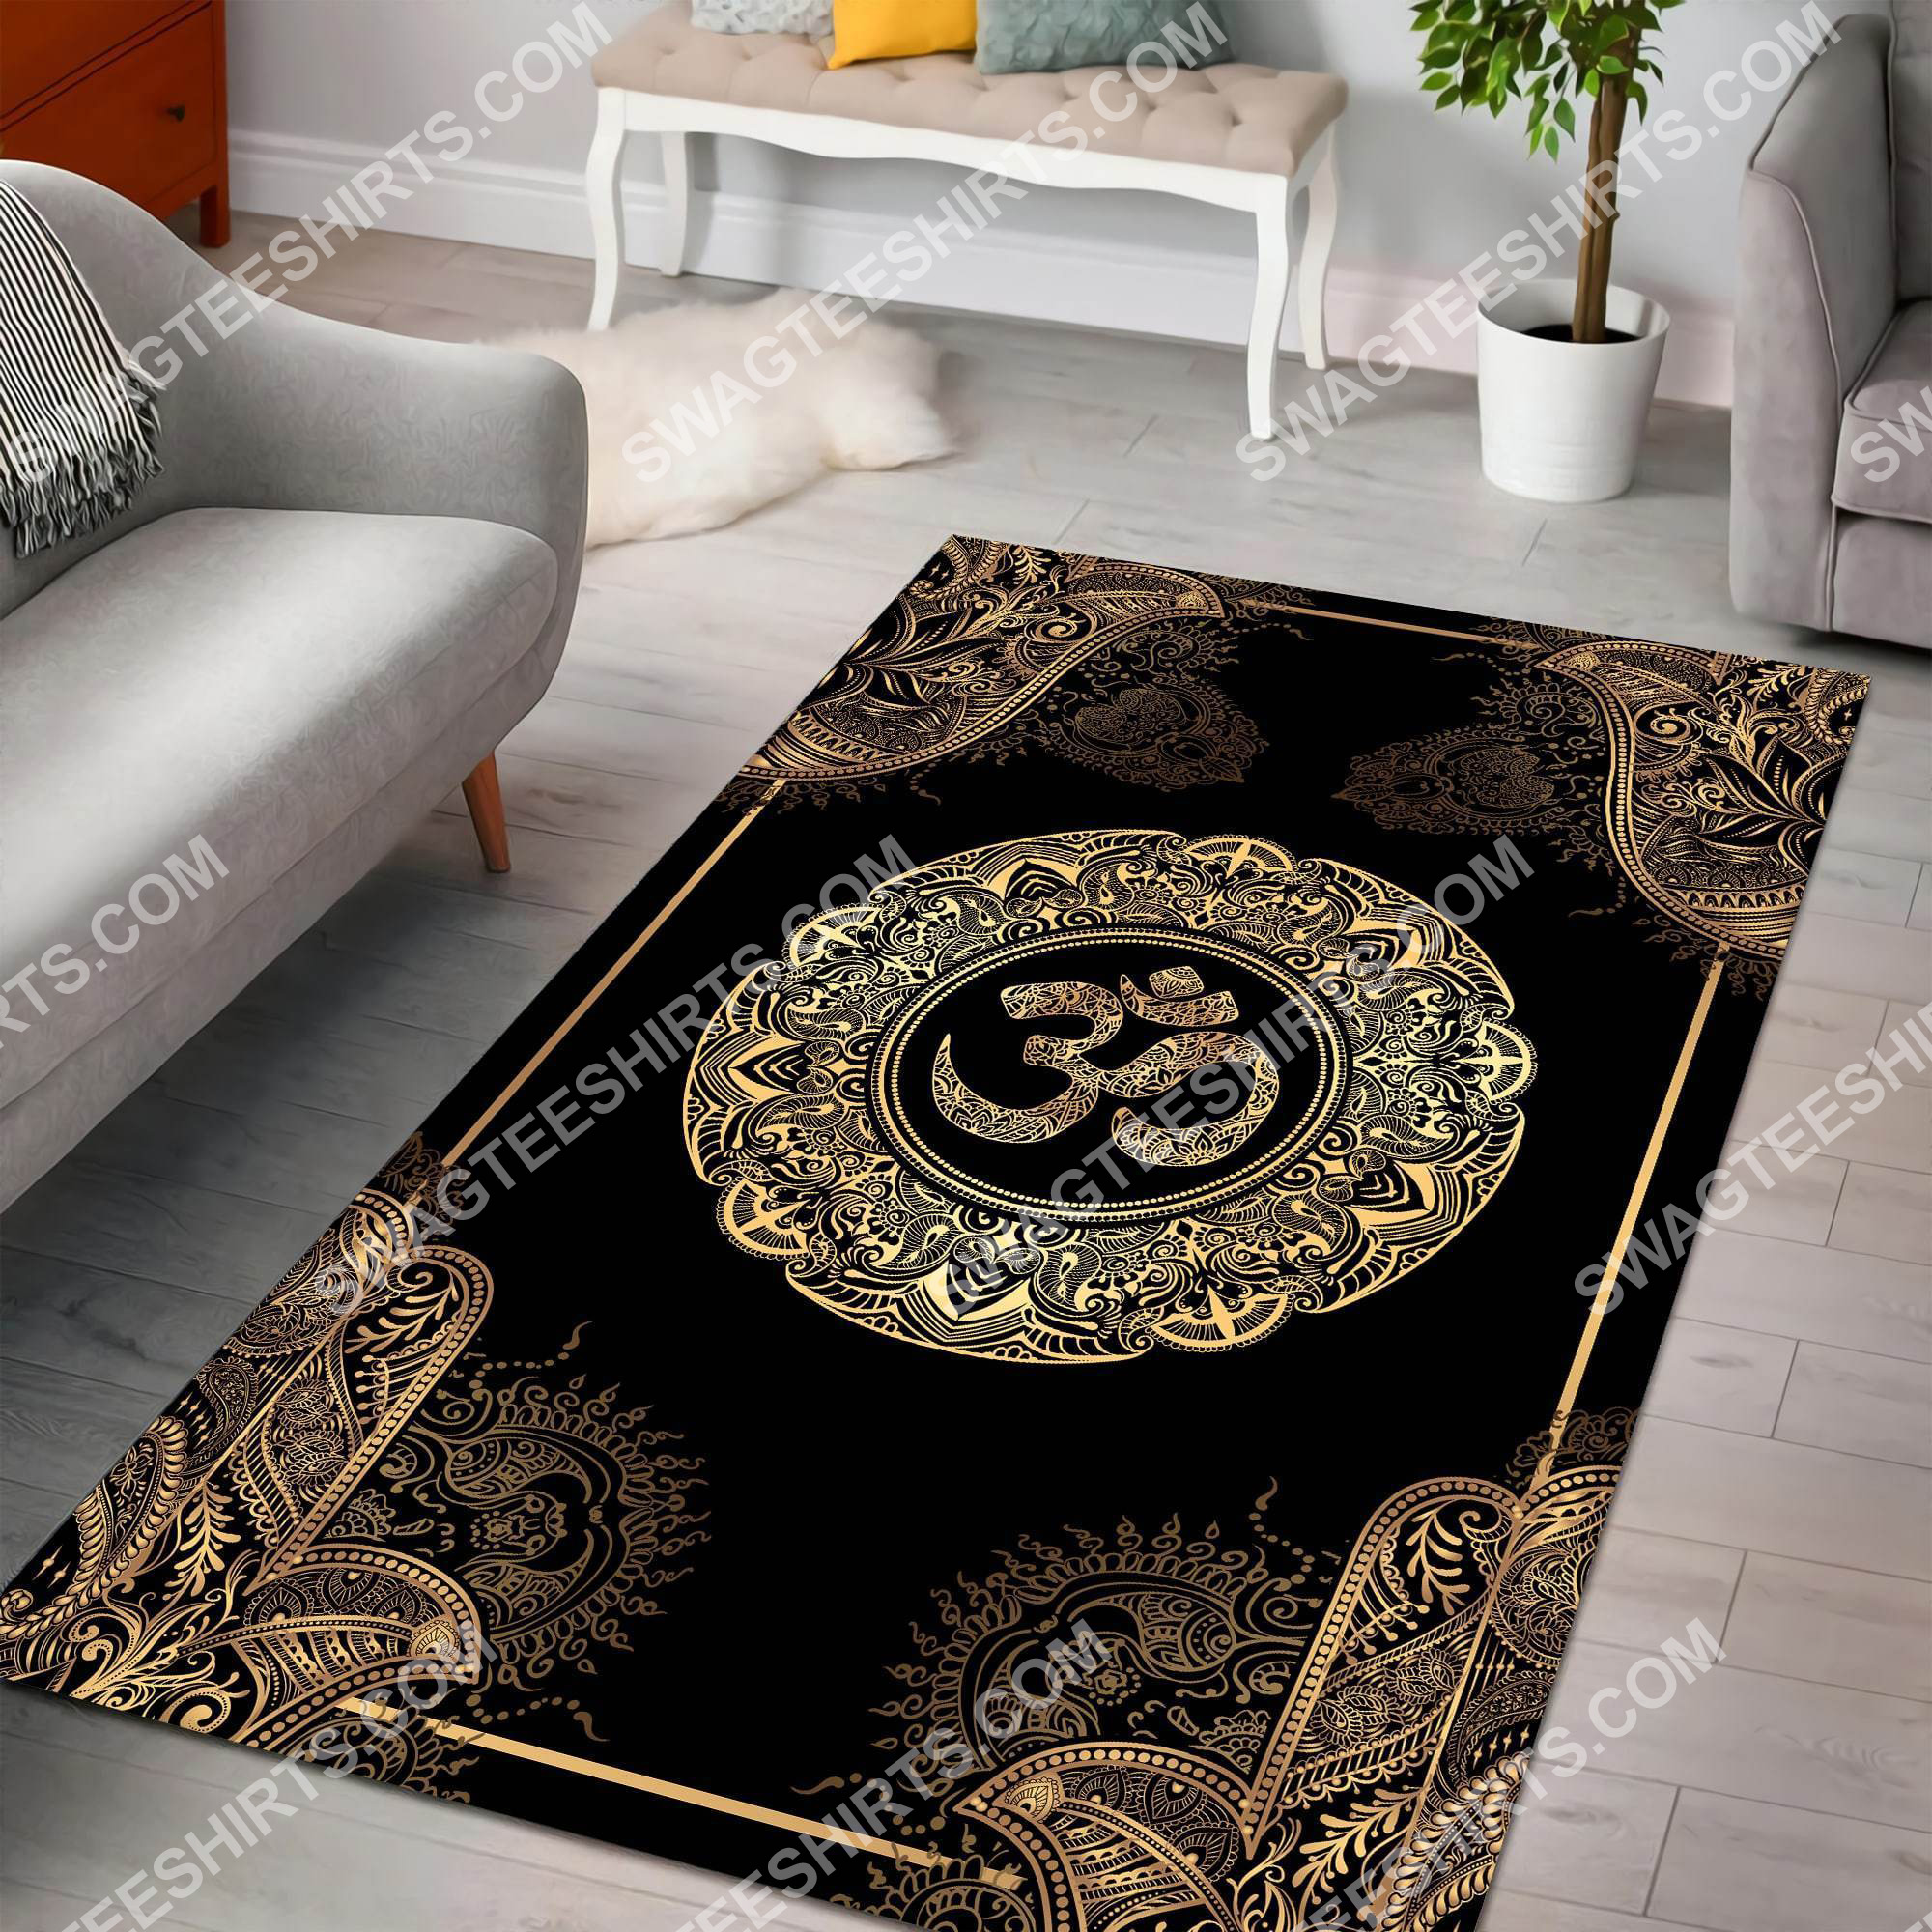 hamsa buddha art pattern all over printed rug 2(1) - Copy